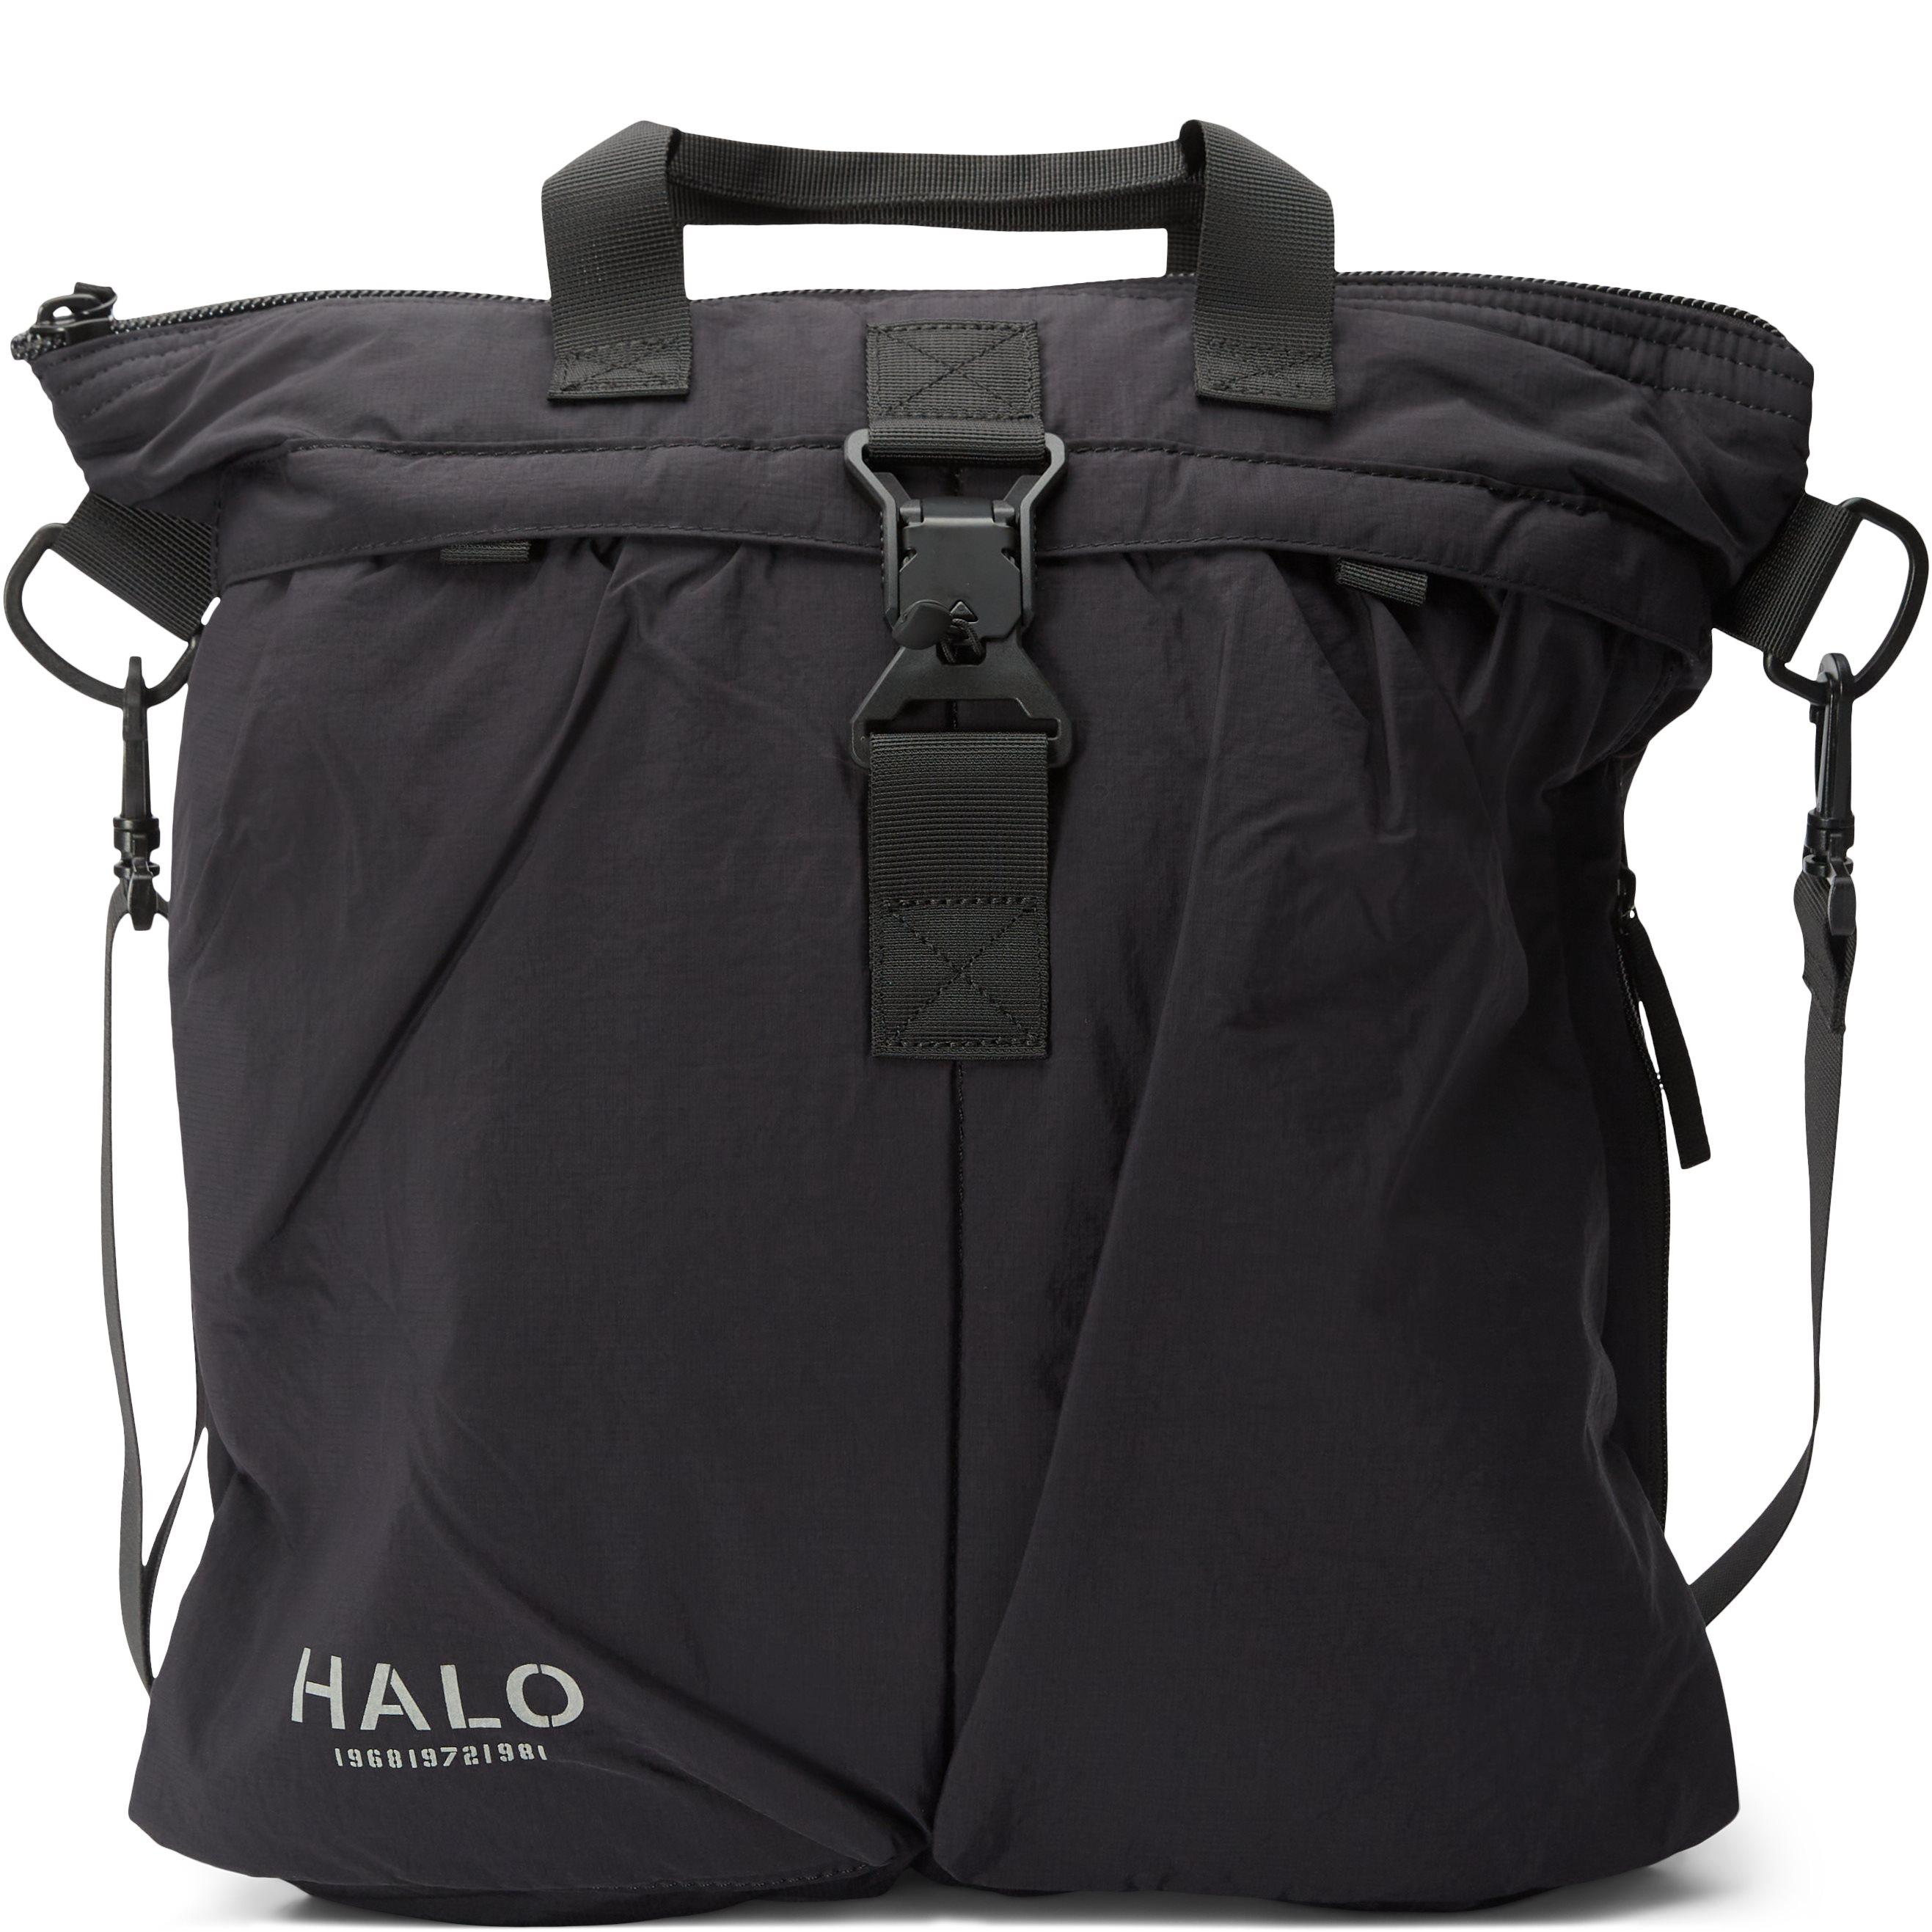 Helmet Bag - Väskor - Svart